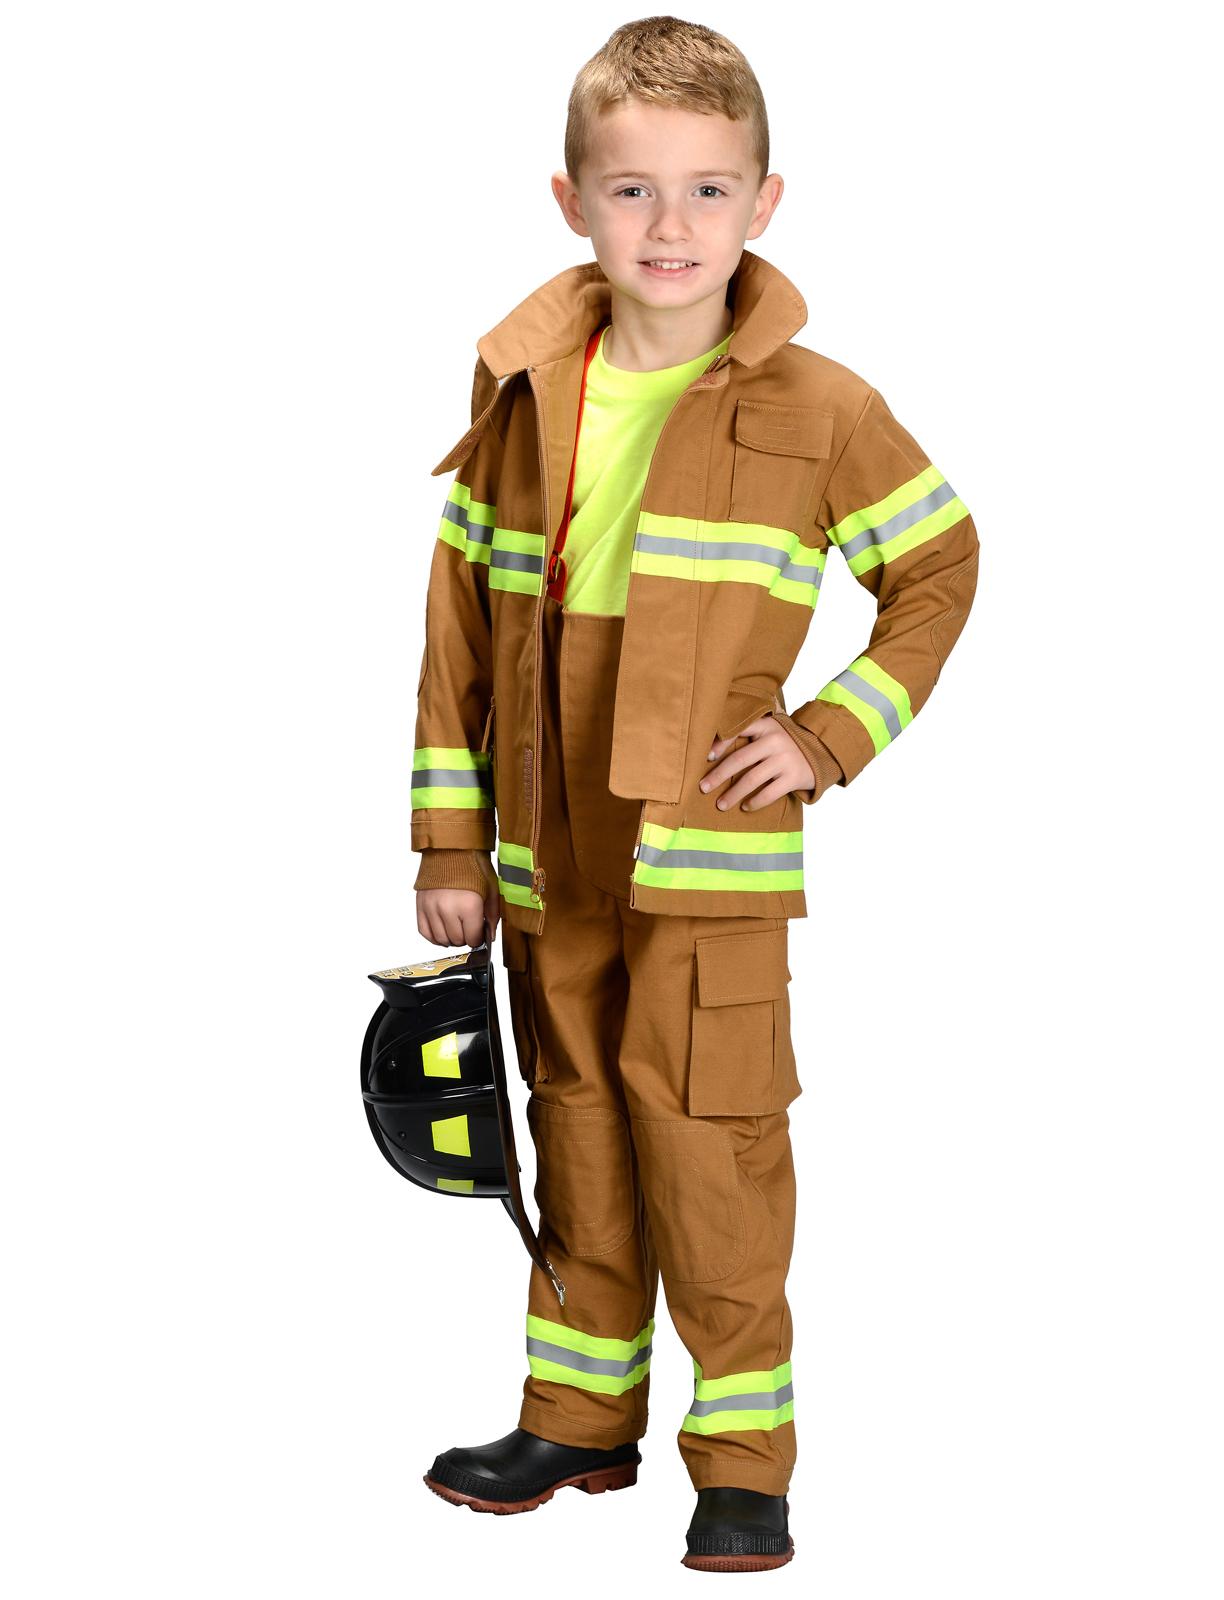 Fireman Child Accessory Kit Jr Fire Fighter Suit Tan Child Costume Bc